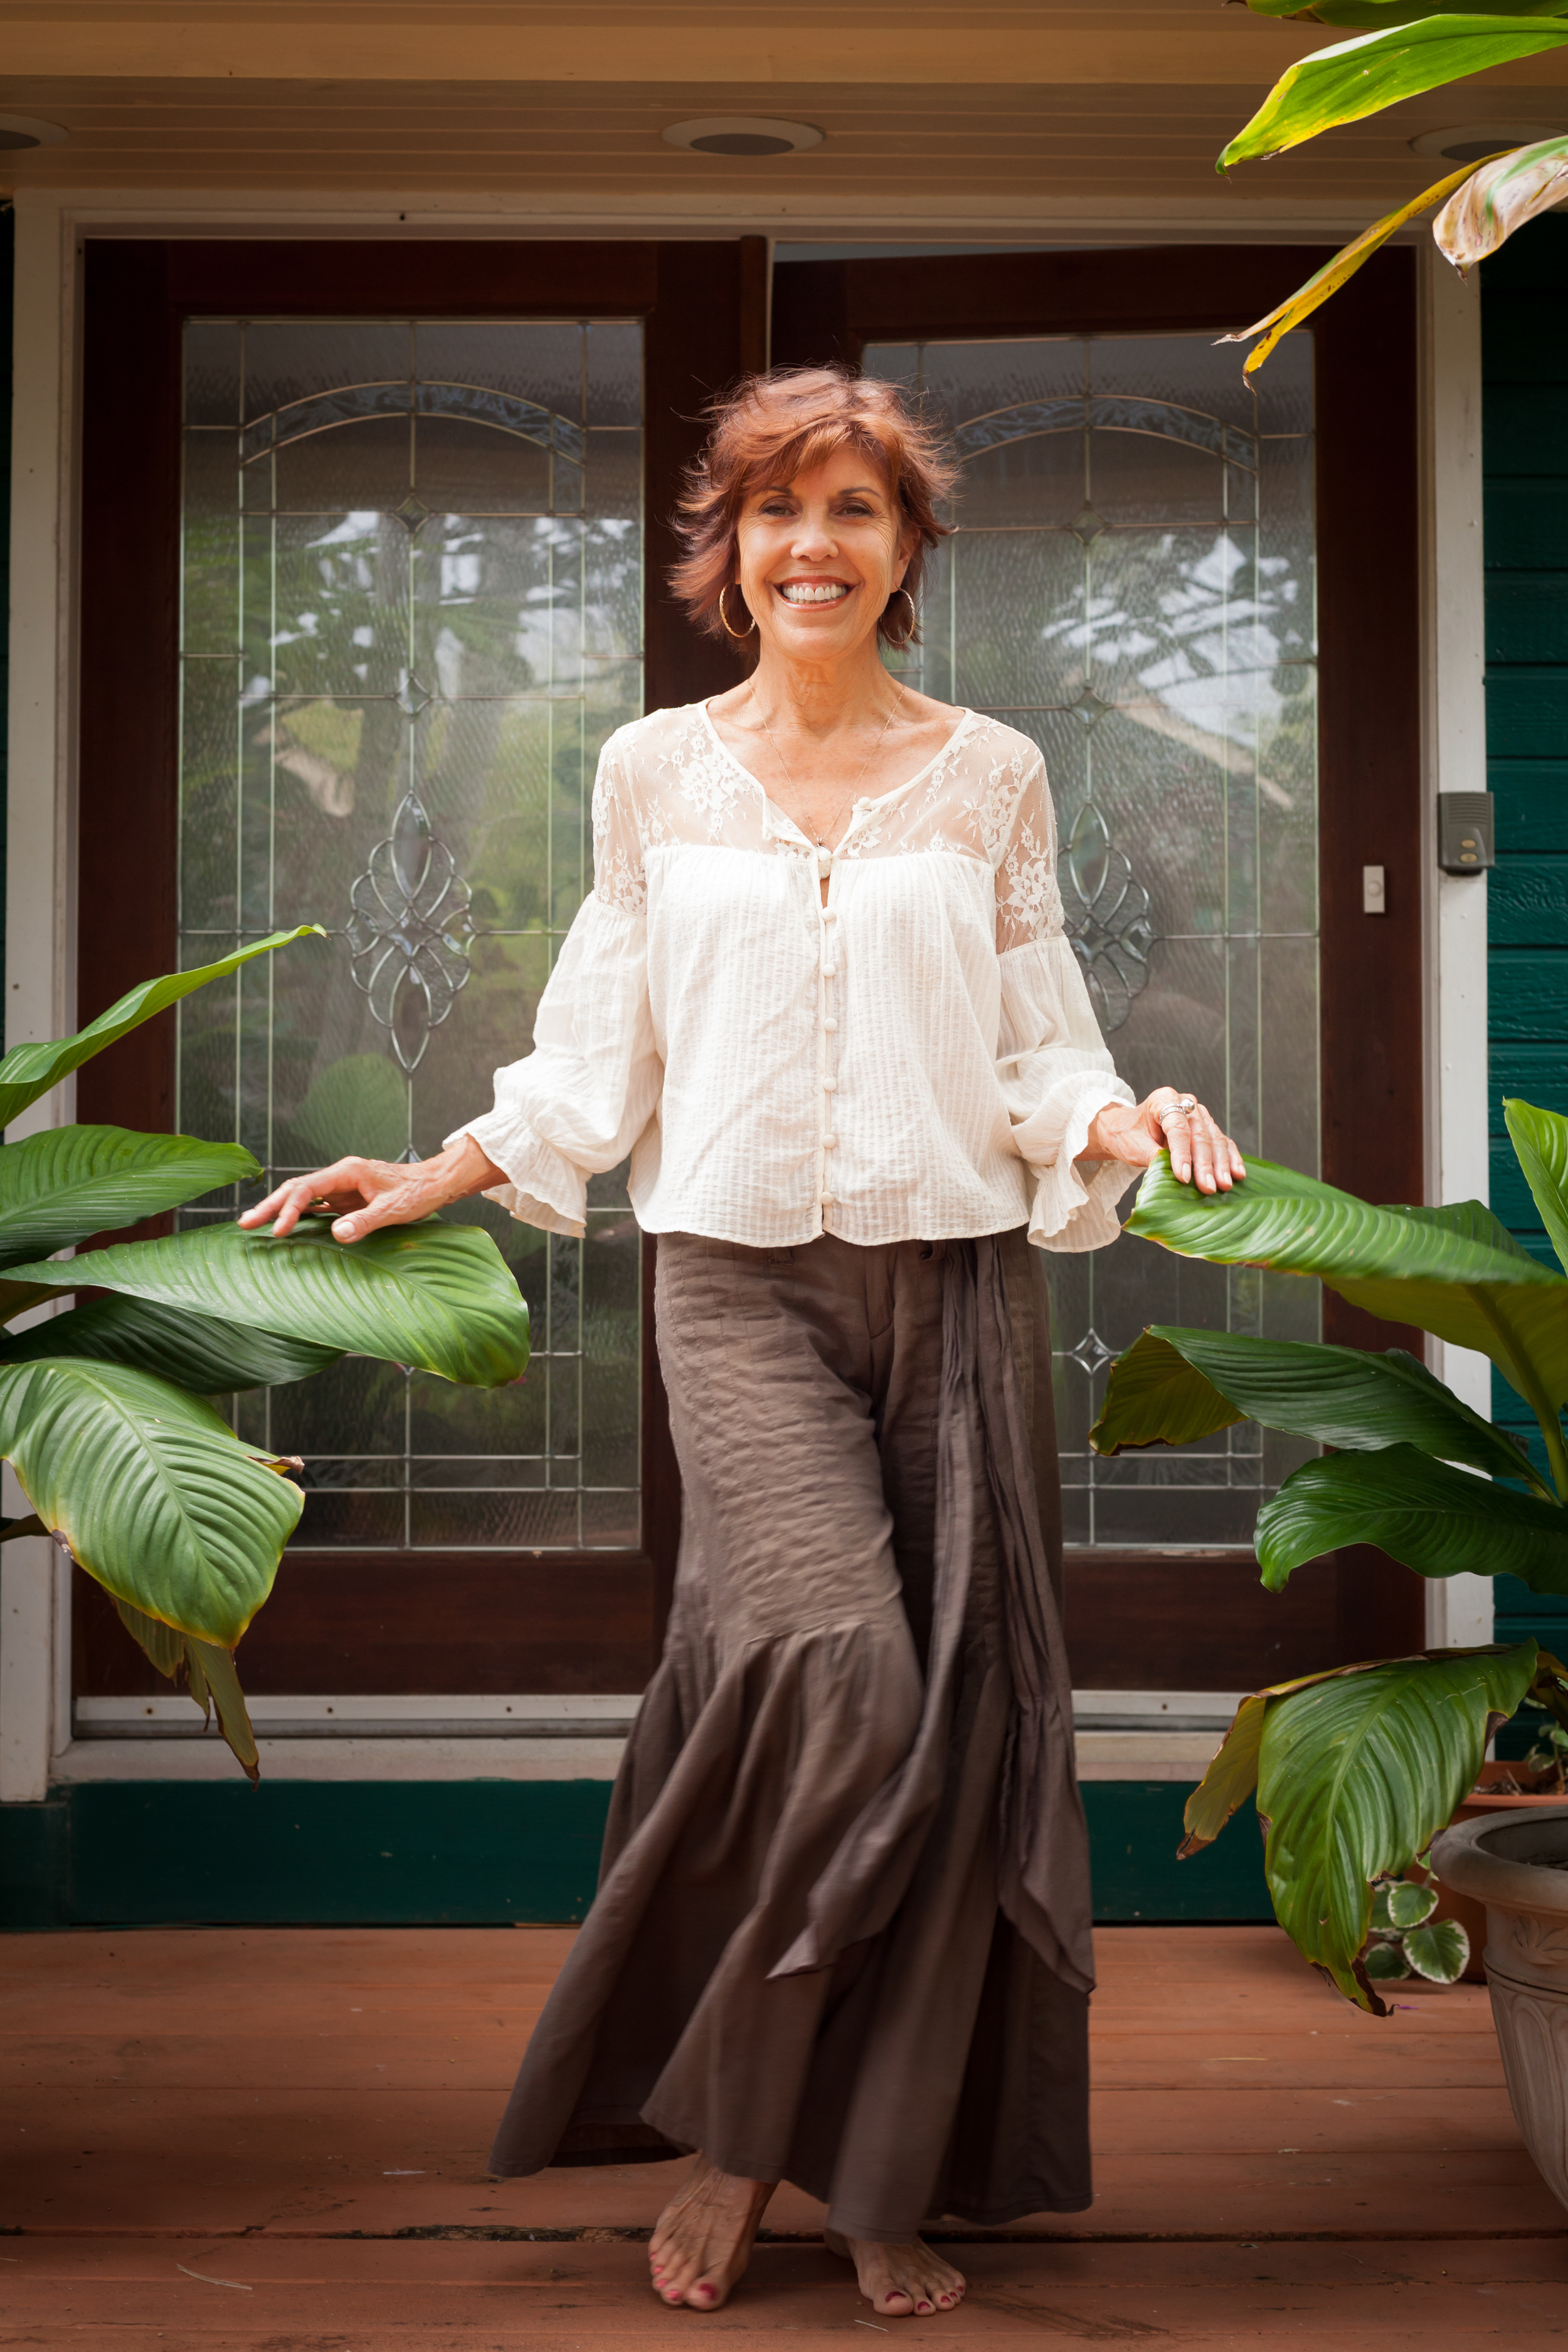 Chef Susan Teton Campbell